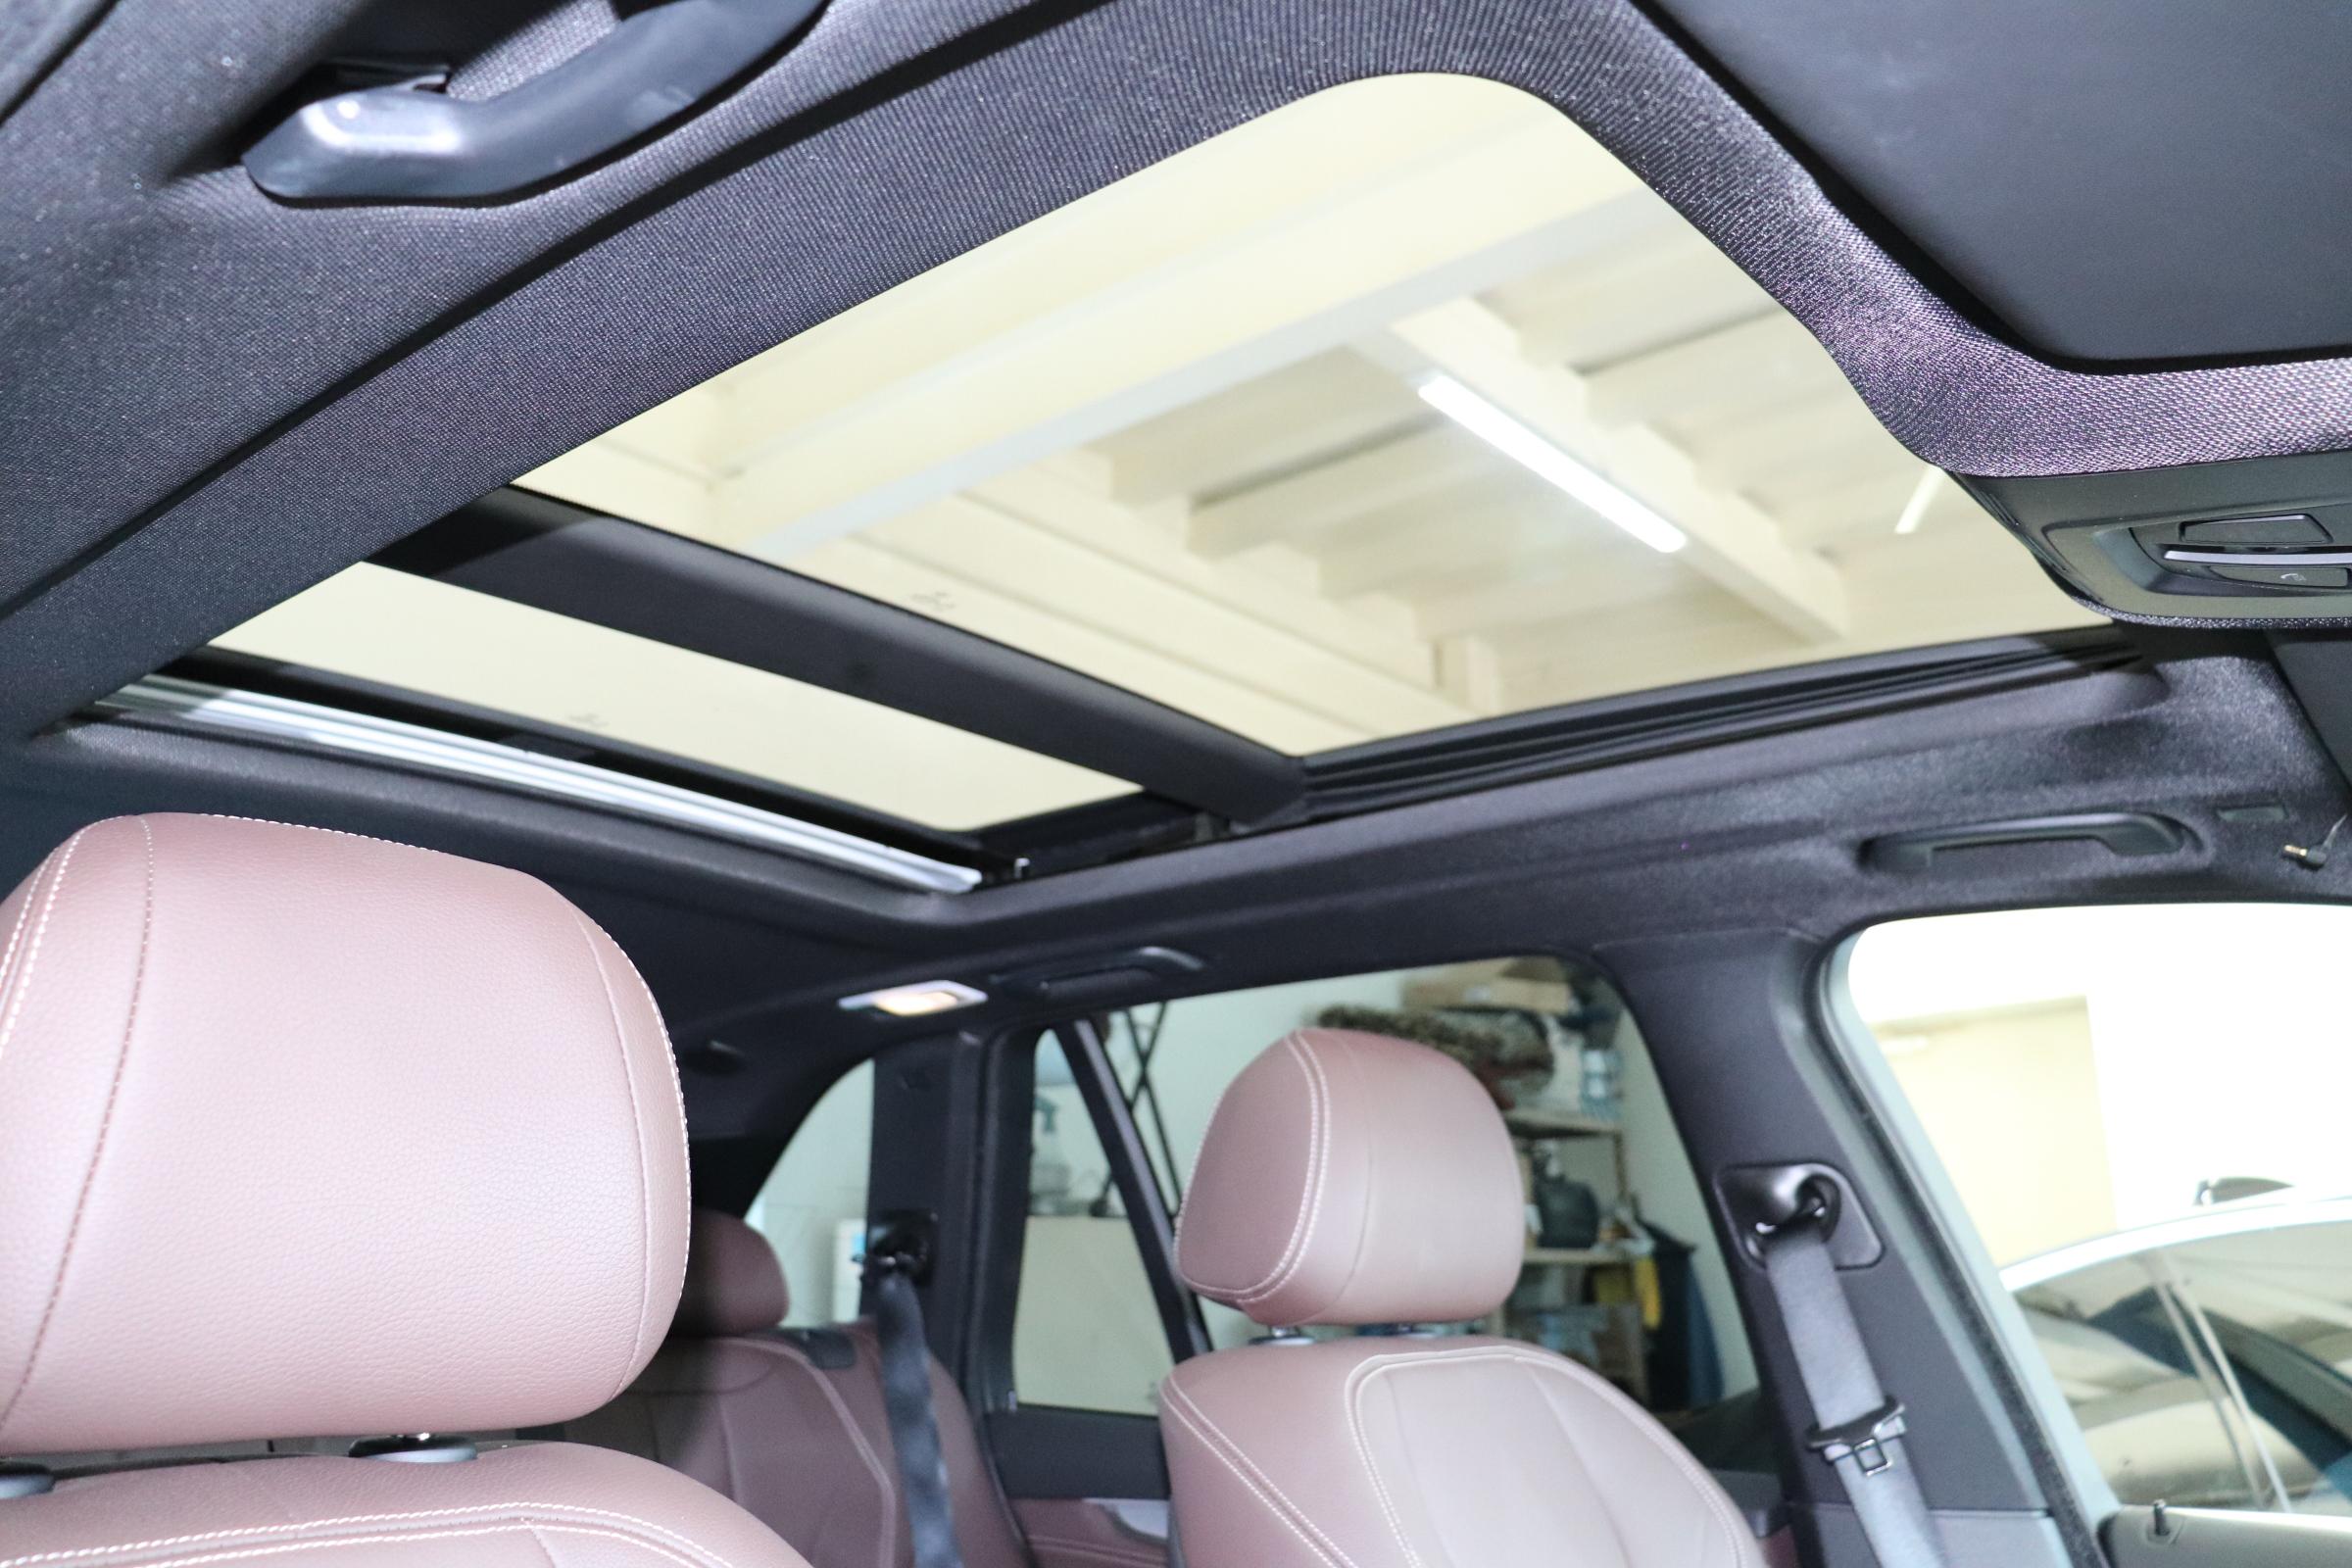 X5 xドライブ 35d Mスポーツ セレクトPKG LEDライト Pサンルーフ Sクローズ ACC 茶革車両画像15